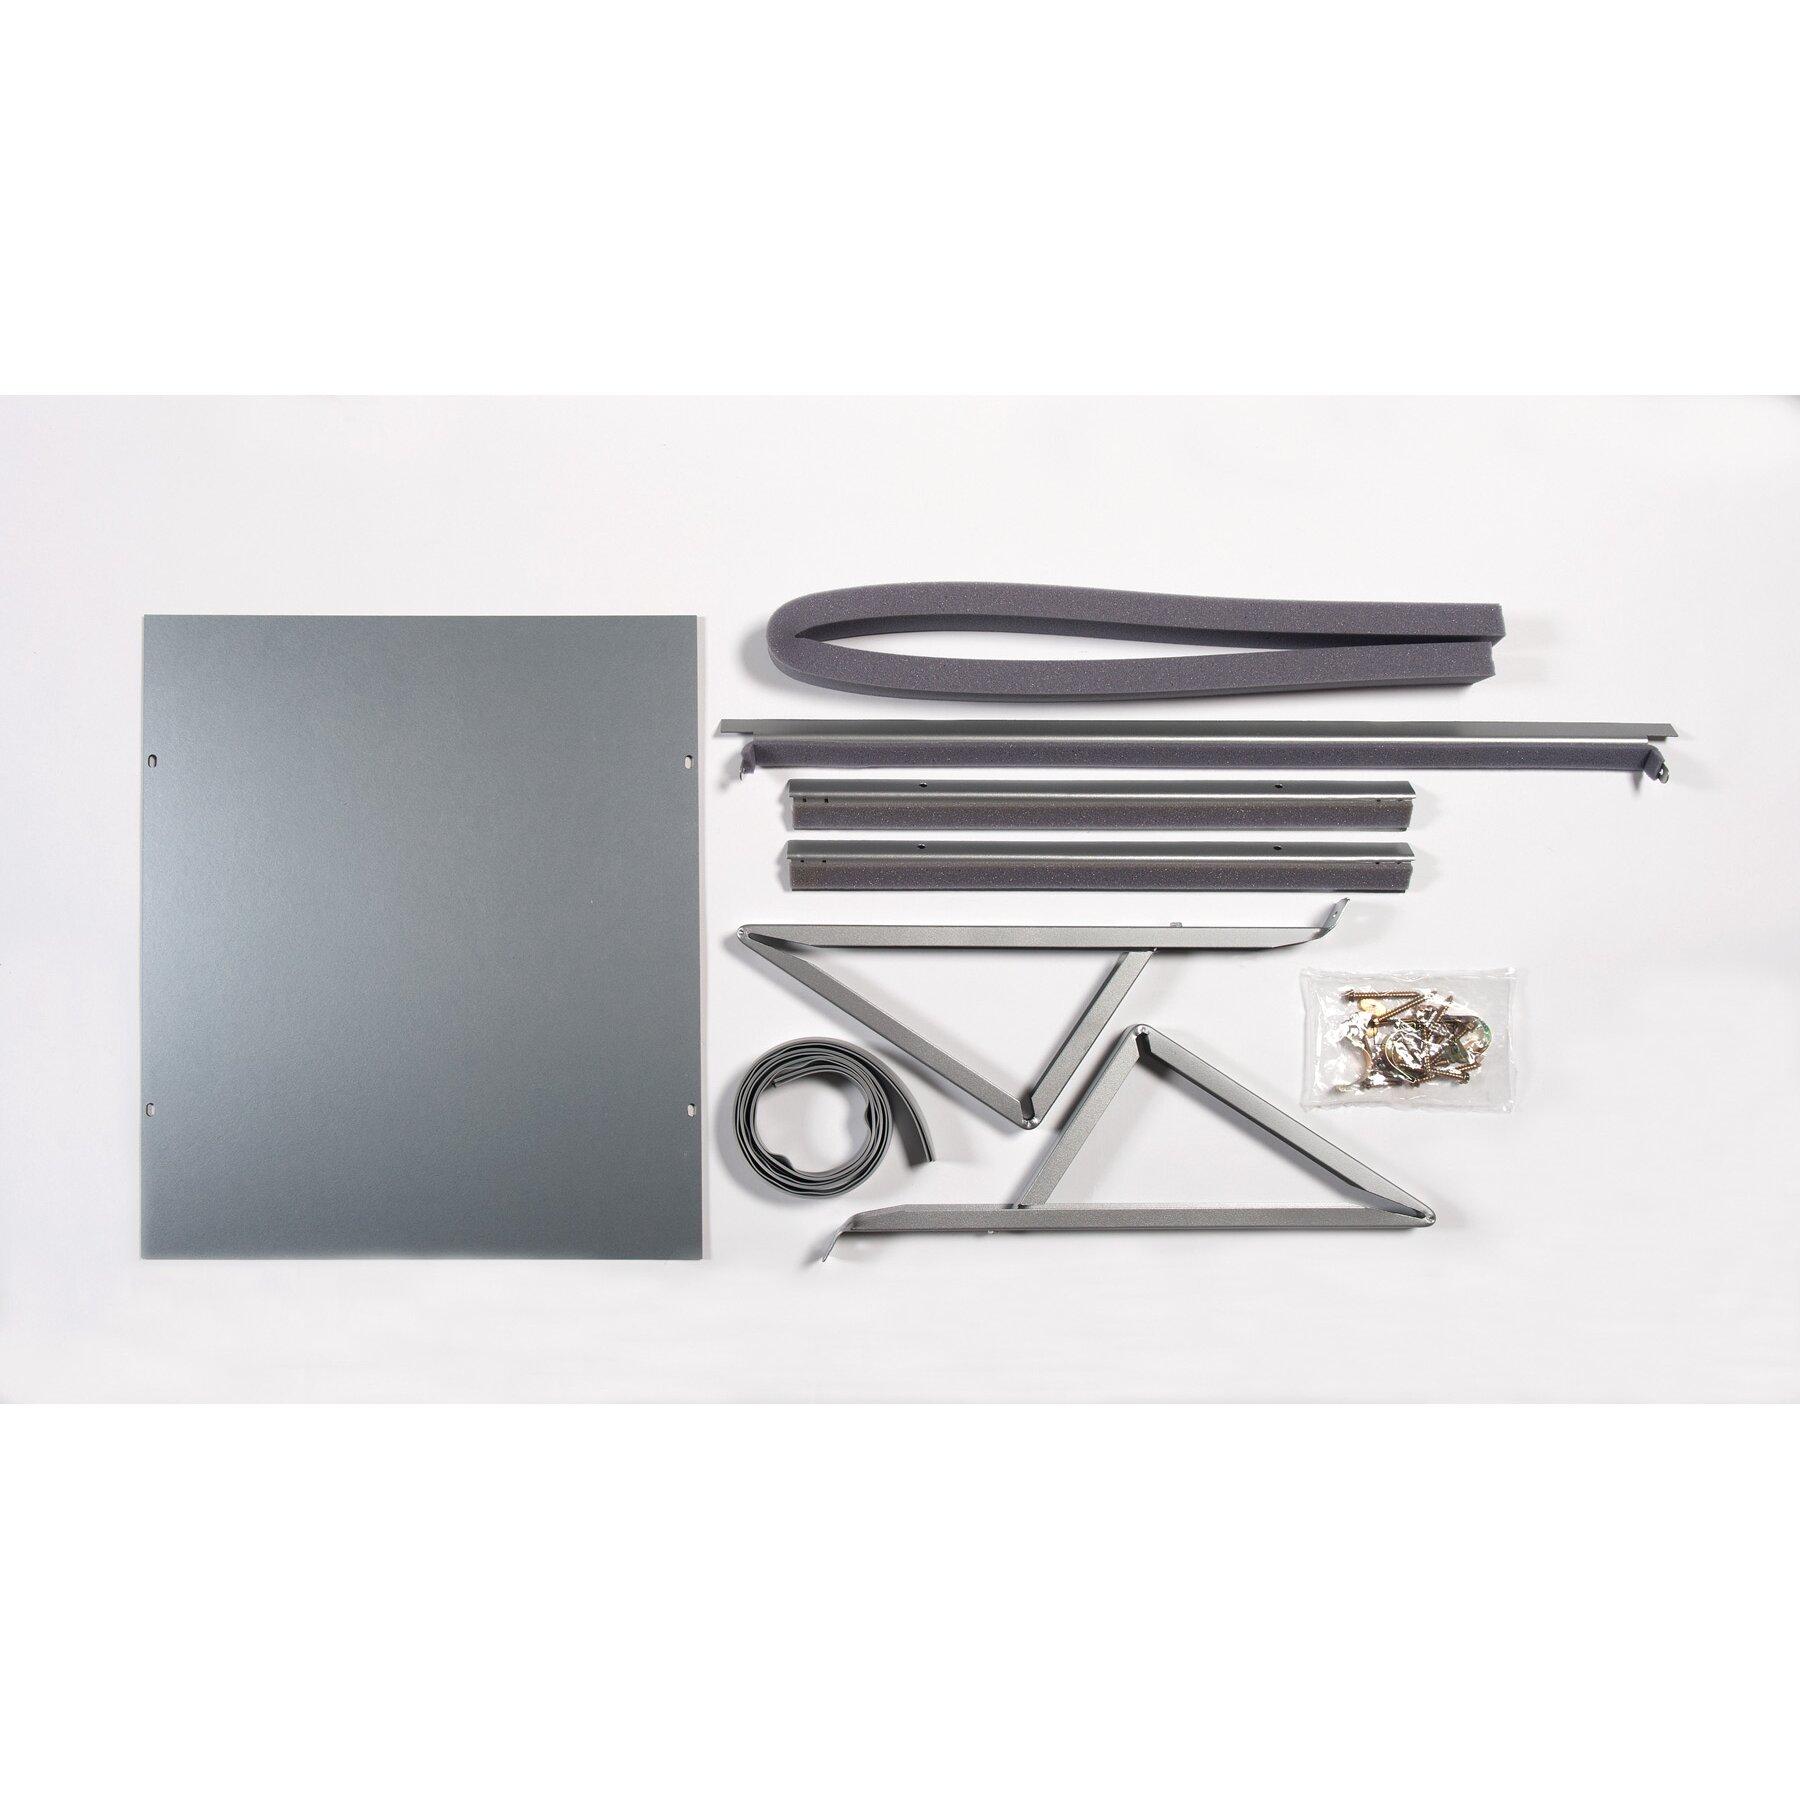 Kuhl 13600 BTU Energy Star Window Air Conditioner & Reviews Wayfair #5B6670